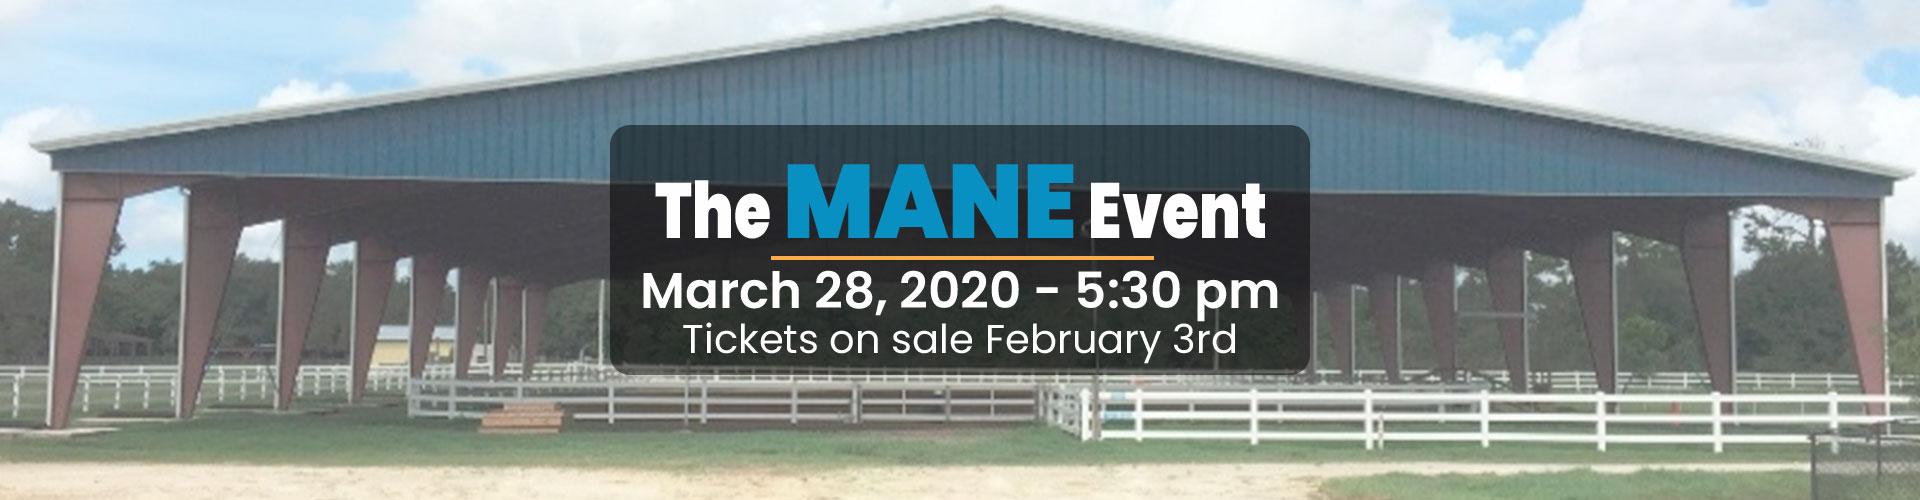 The-MANE-Event-Heading